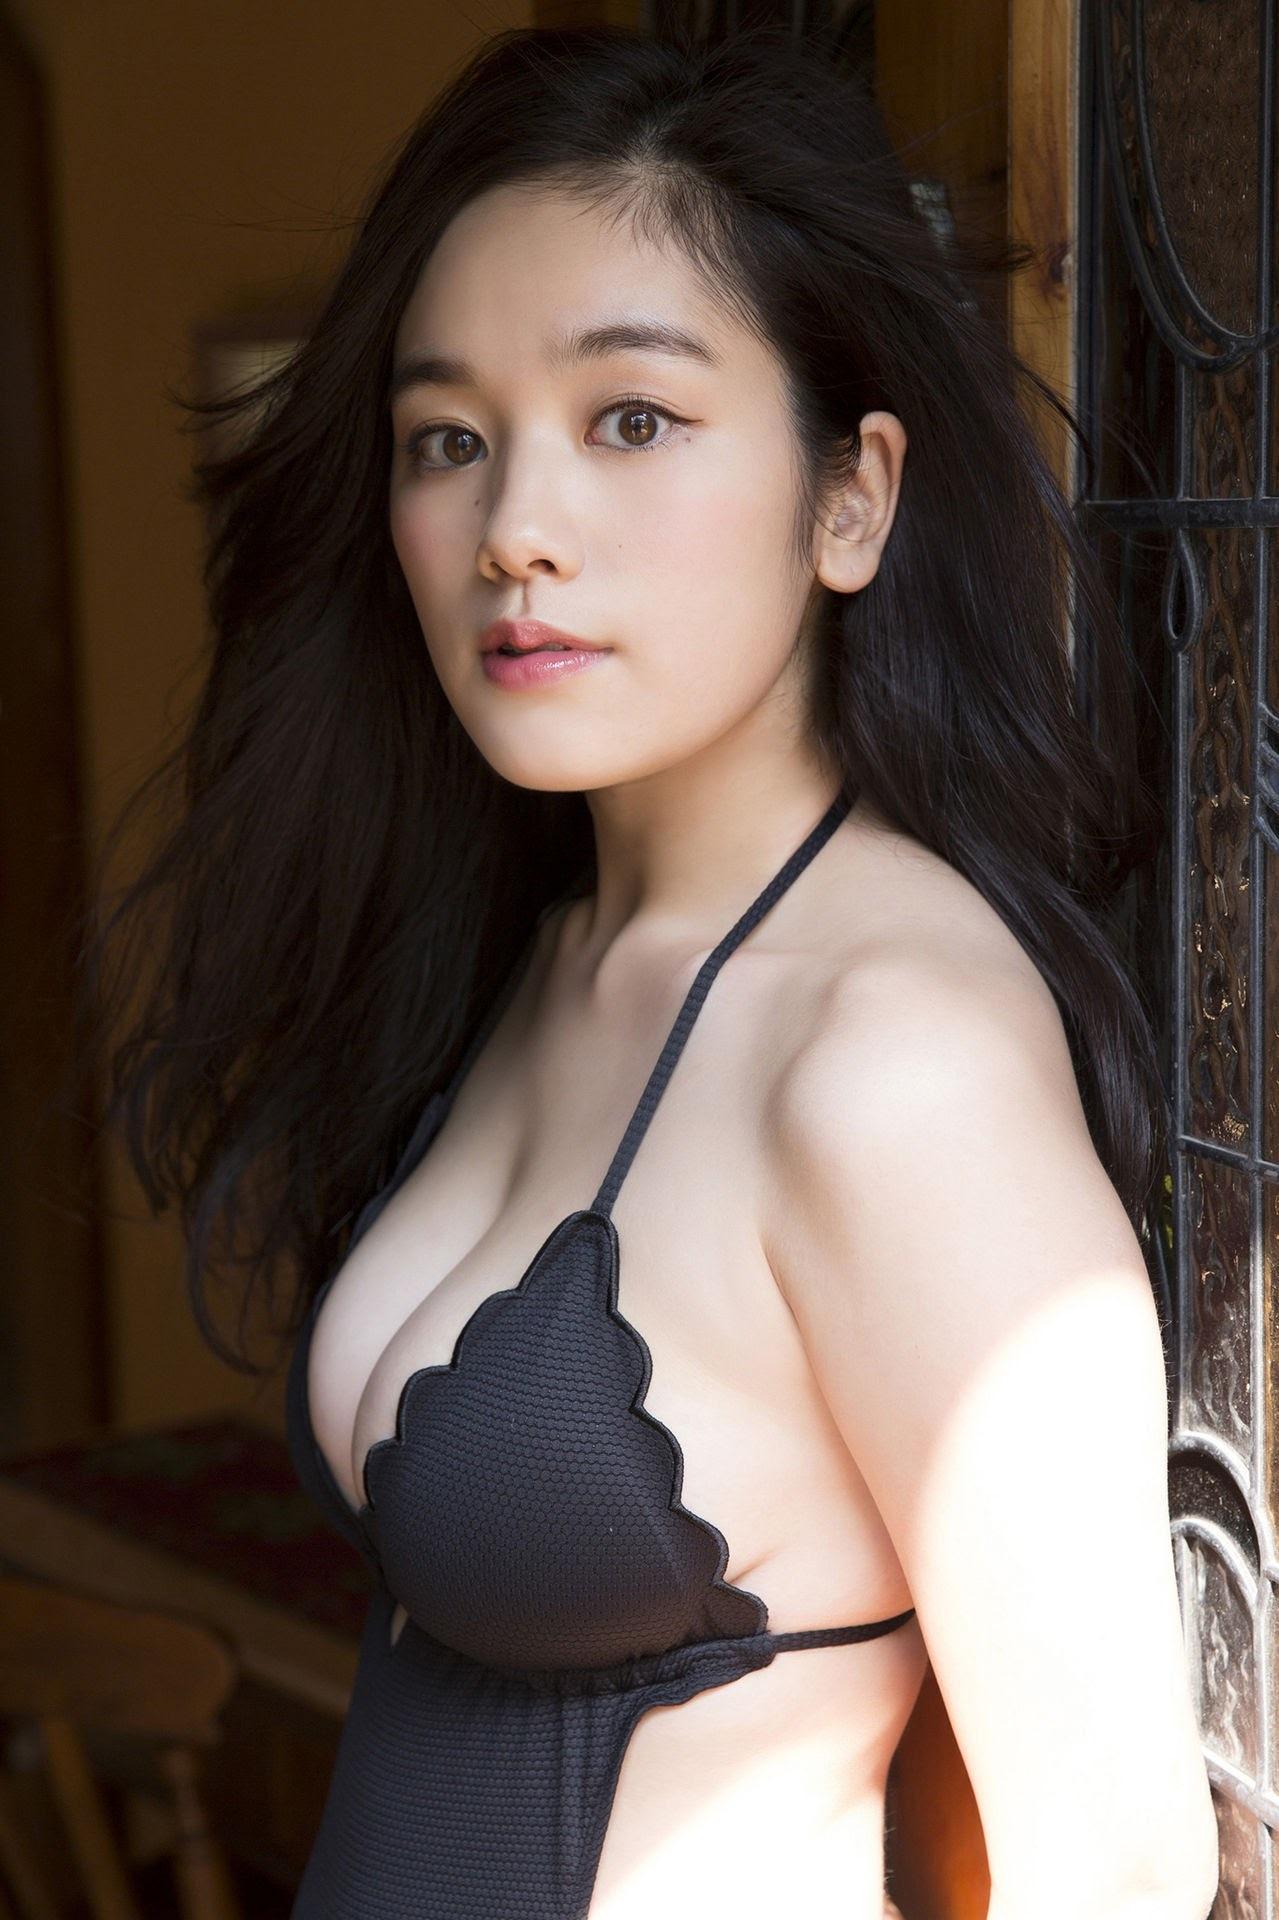 Goddess of Temptation Miwako Kakehi 034